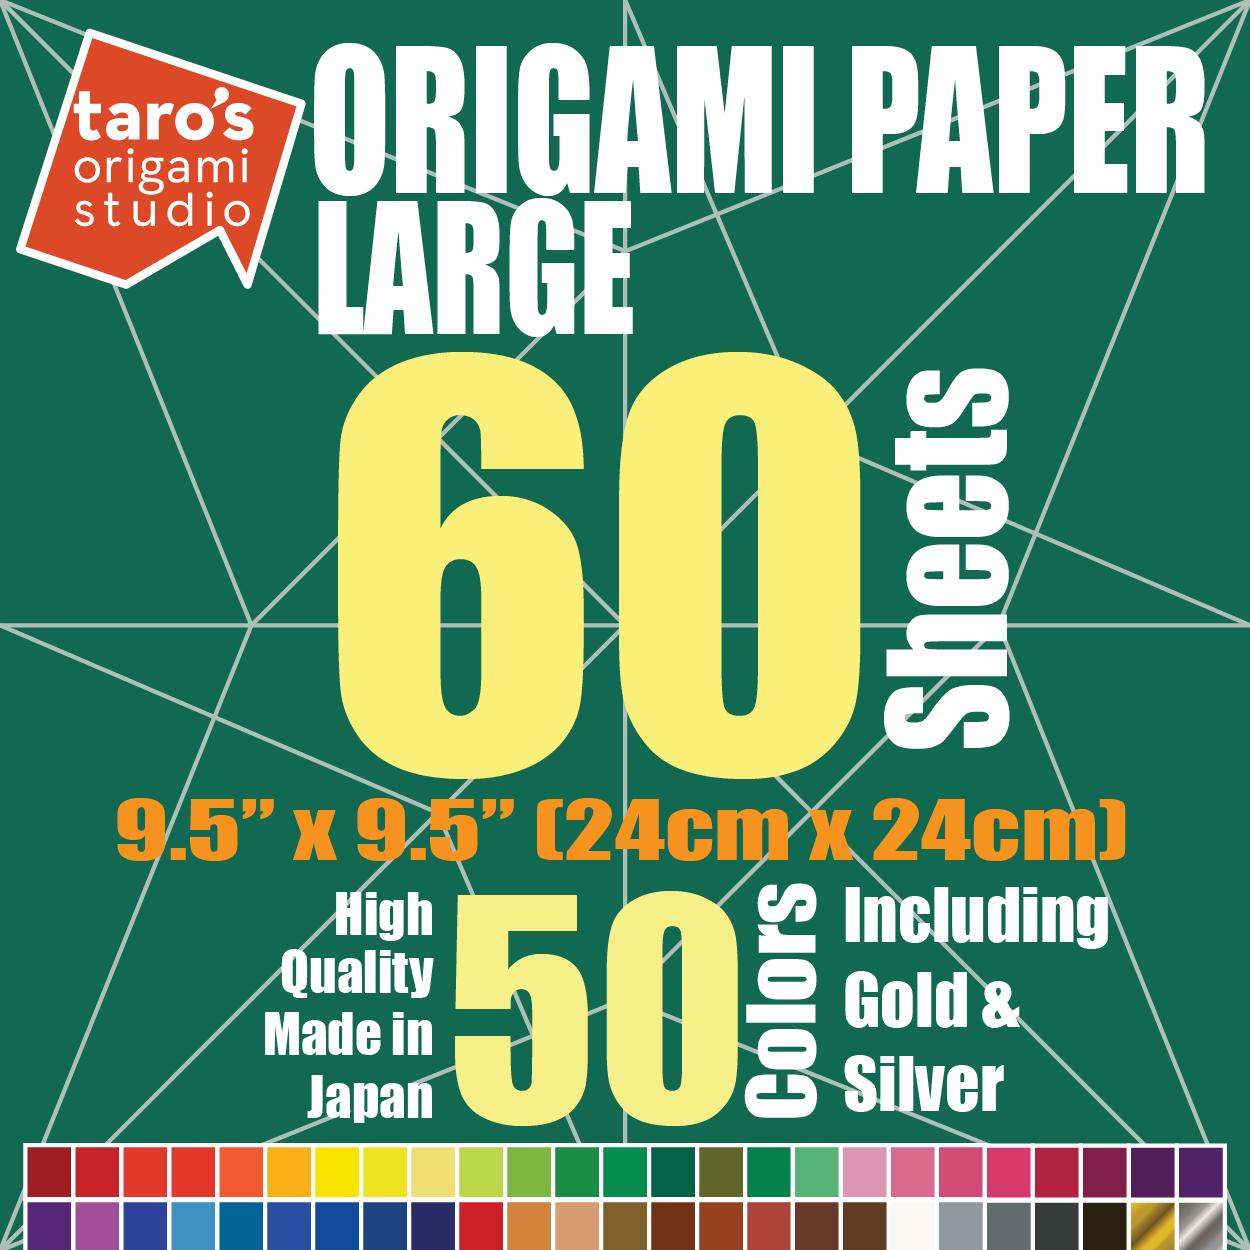 1000 Pure White Origami Paper Cranes Craft 15x15cm Large Origami ... | 1250x1250